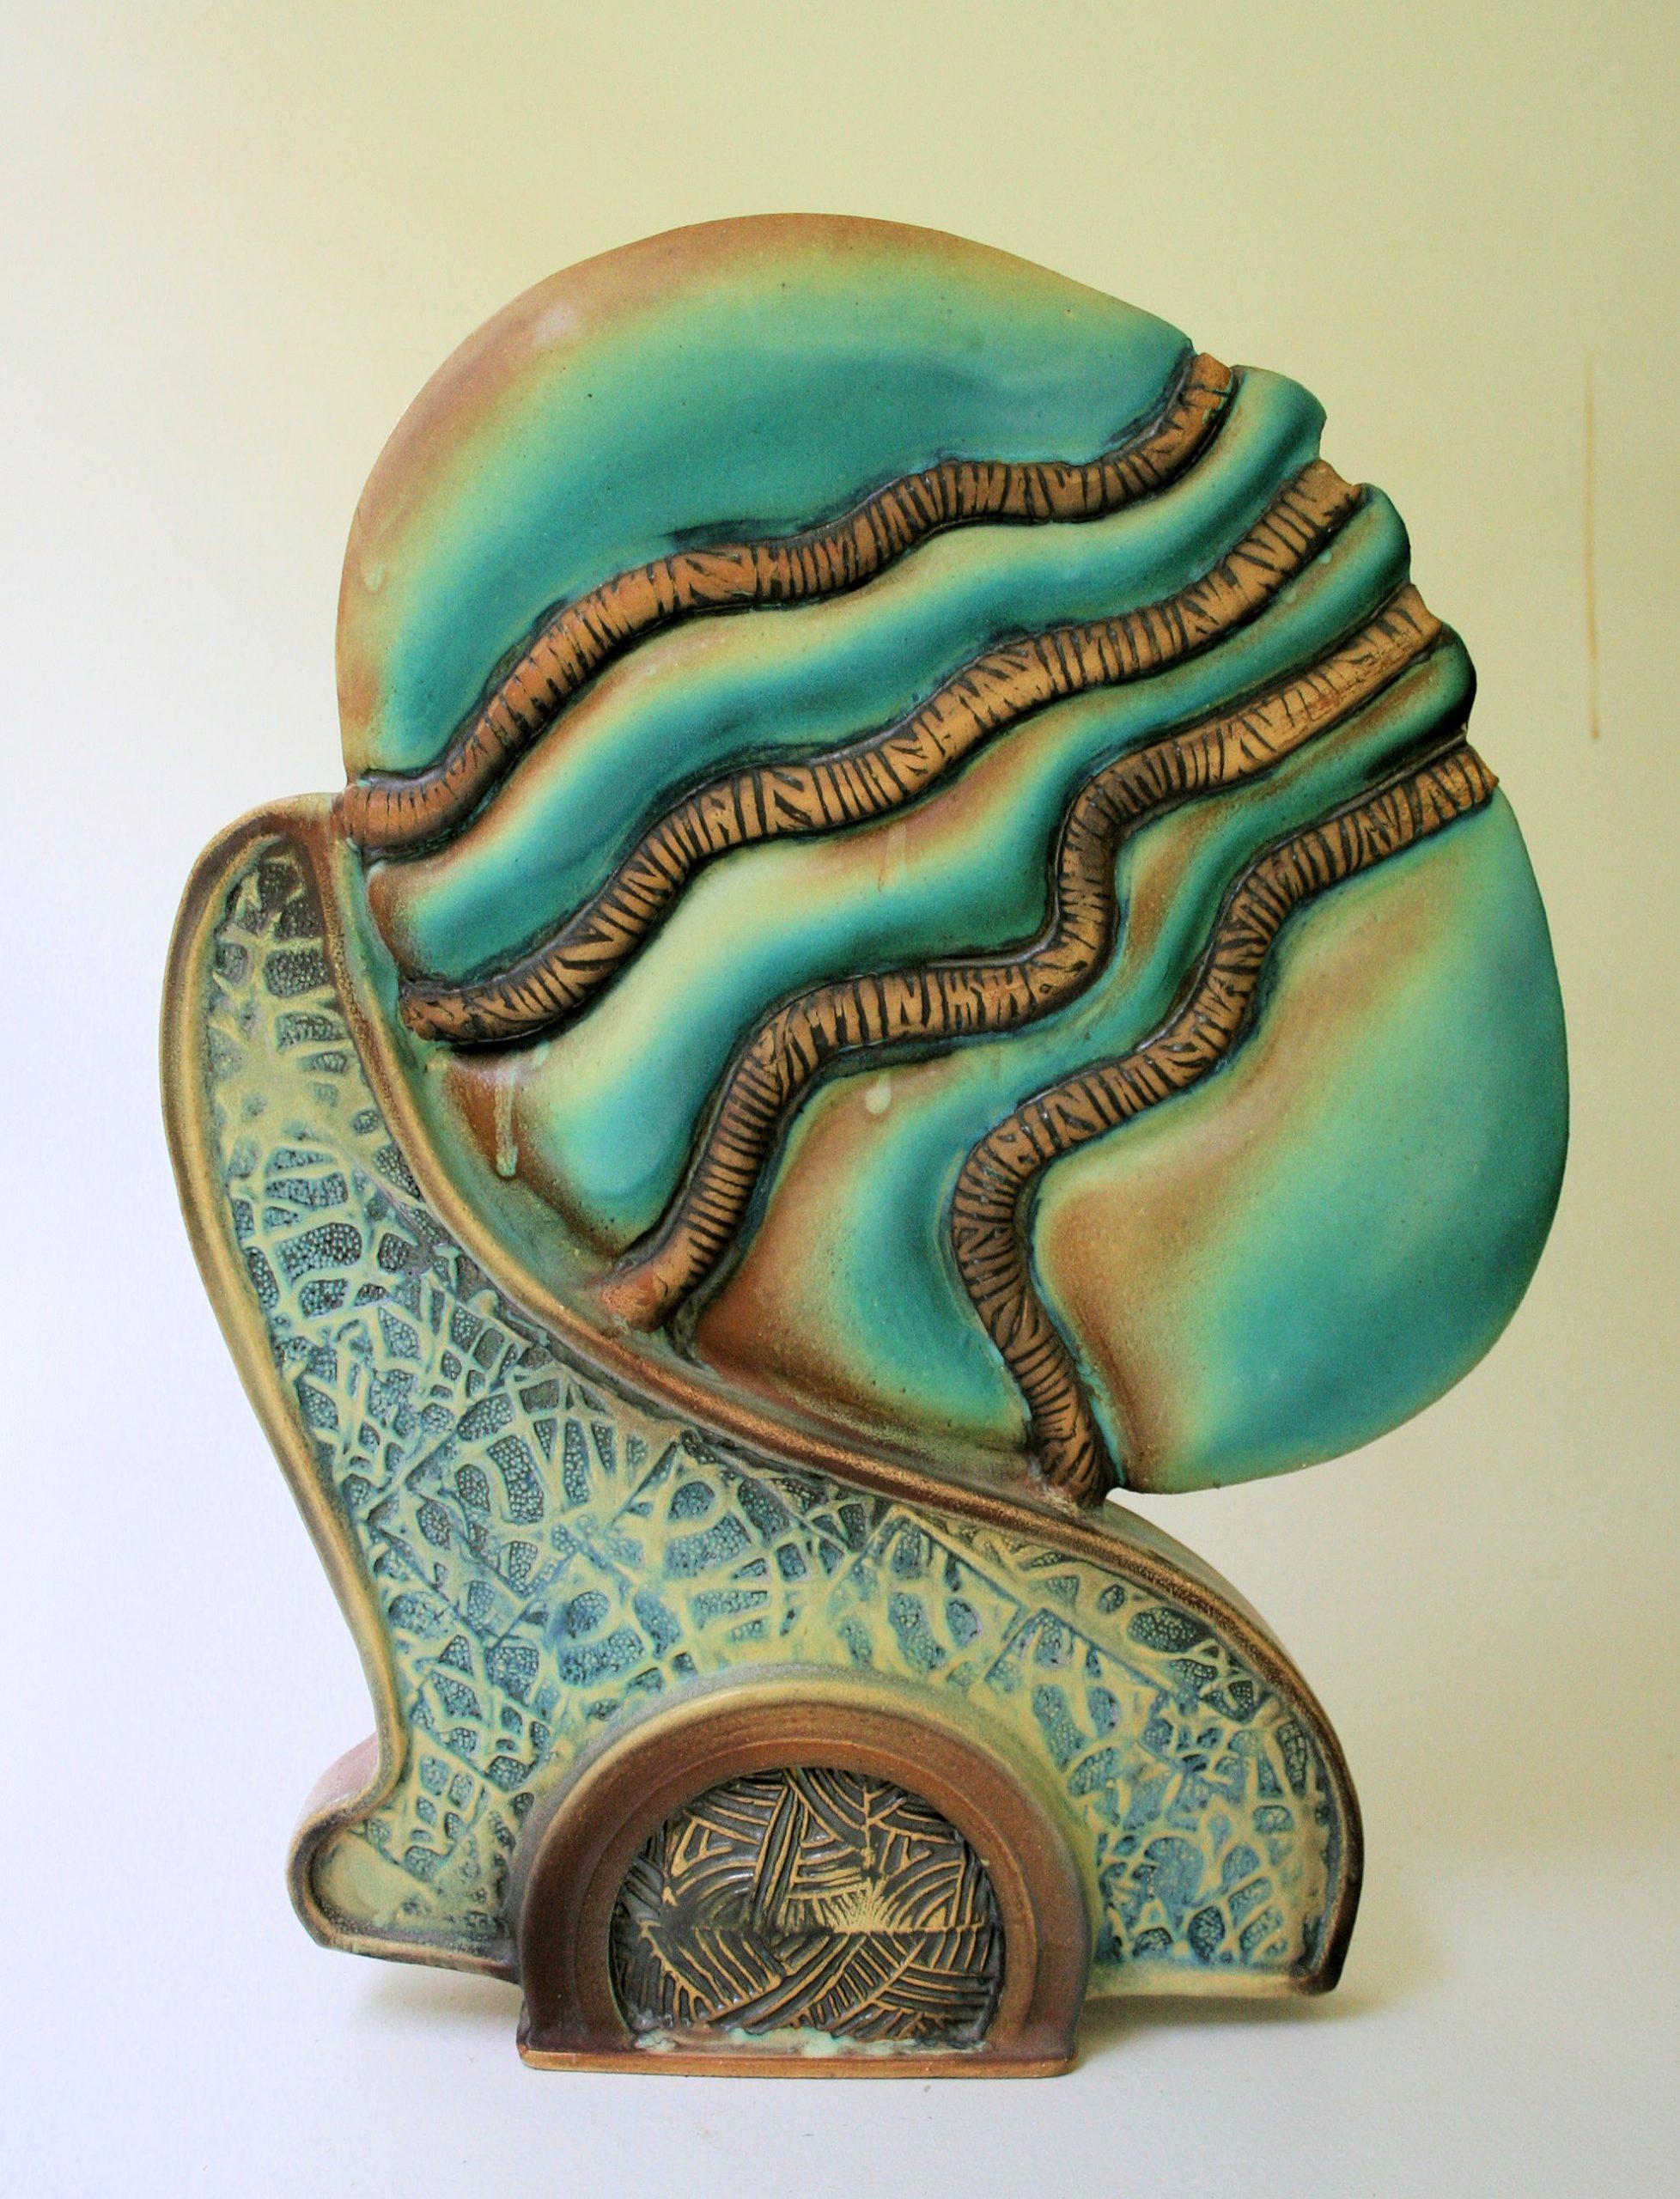 New Divide by Helene Fielder